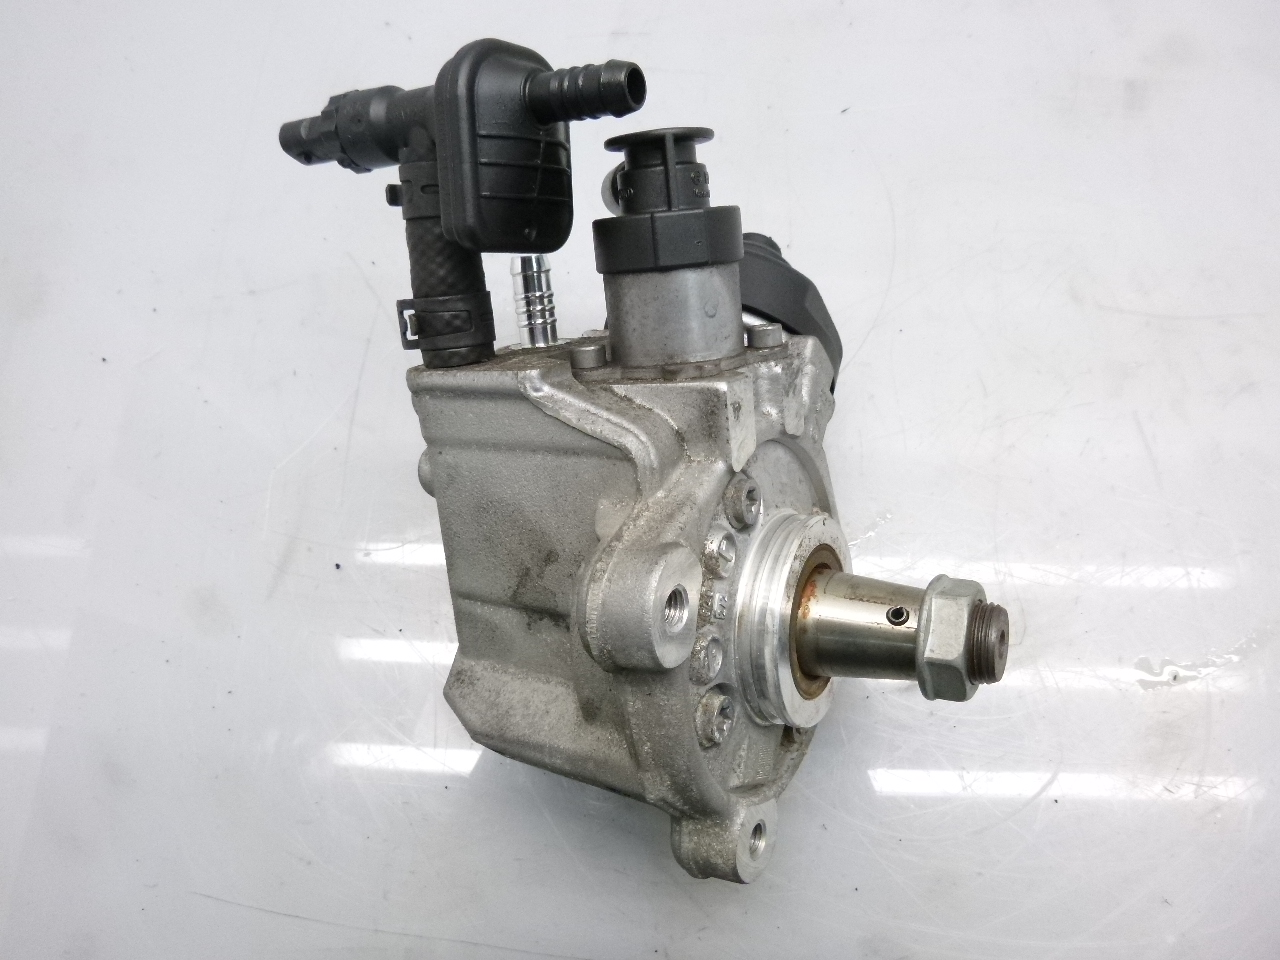 Hochdruckpumpe VW Crafter 30-35 30-50 2,0 TDI CKU CKUB CKUC 03D